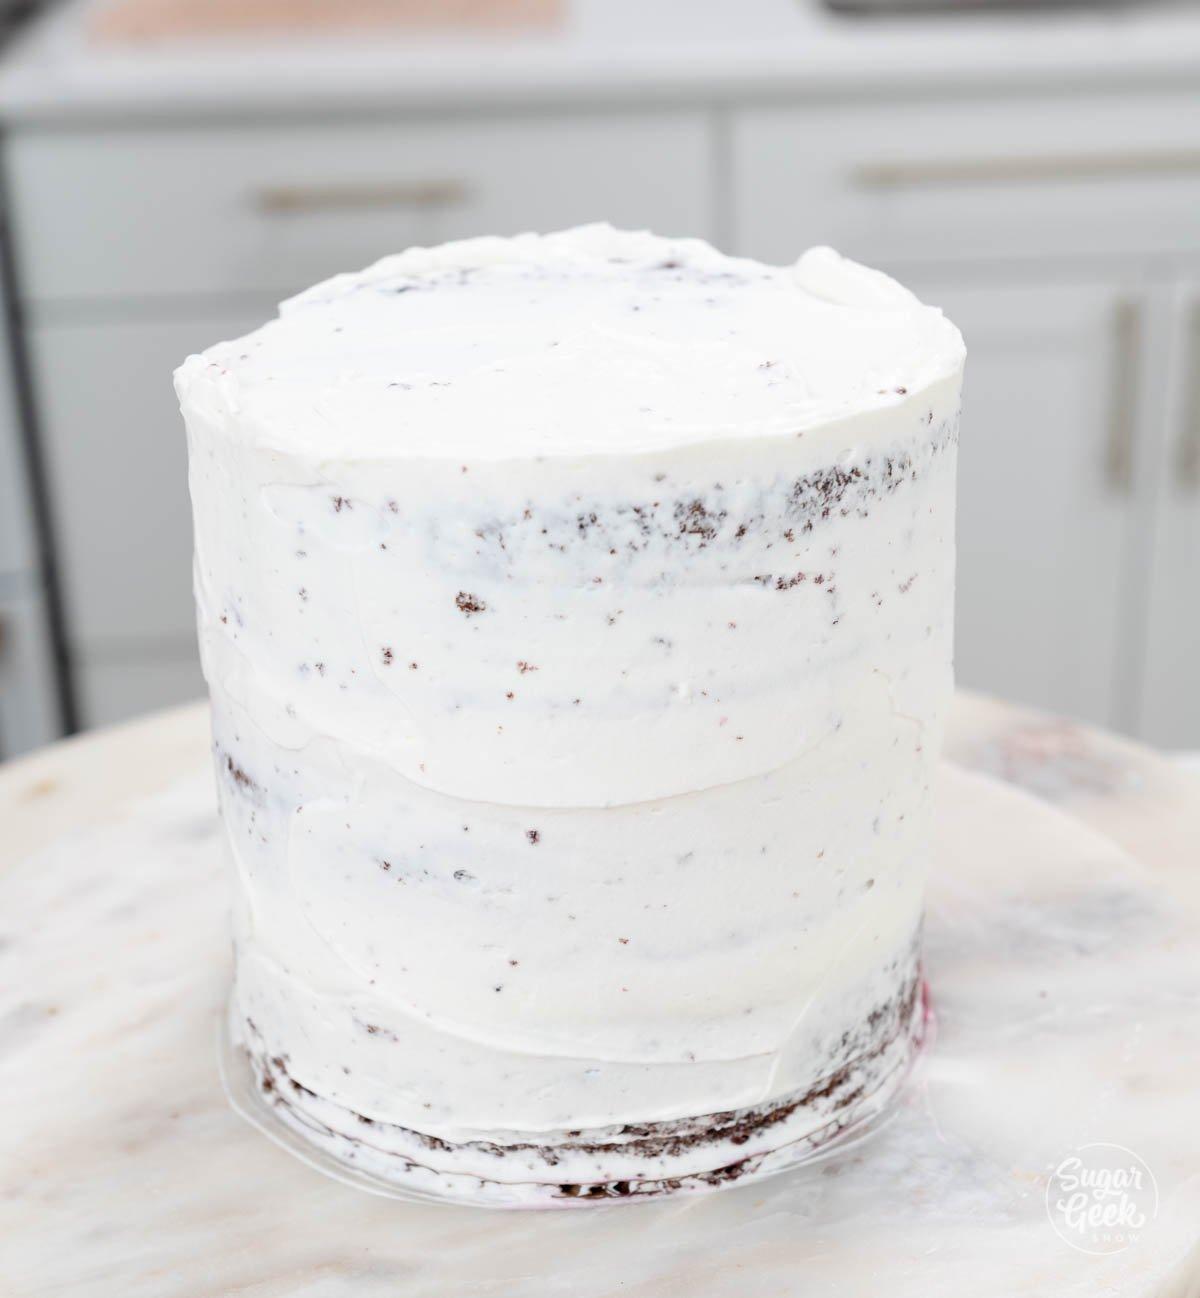 crumbcoat on genoise cake